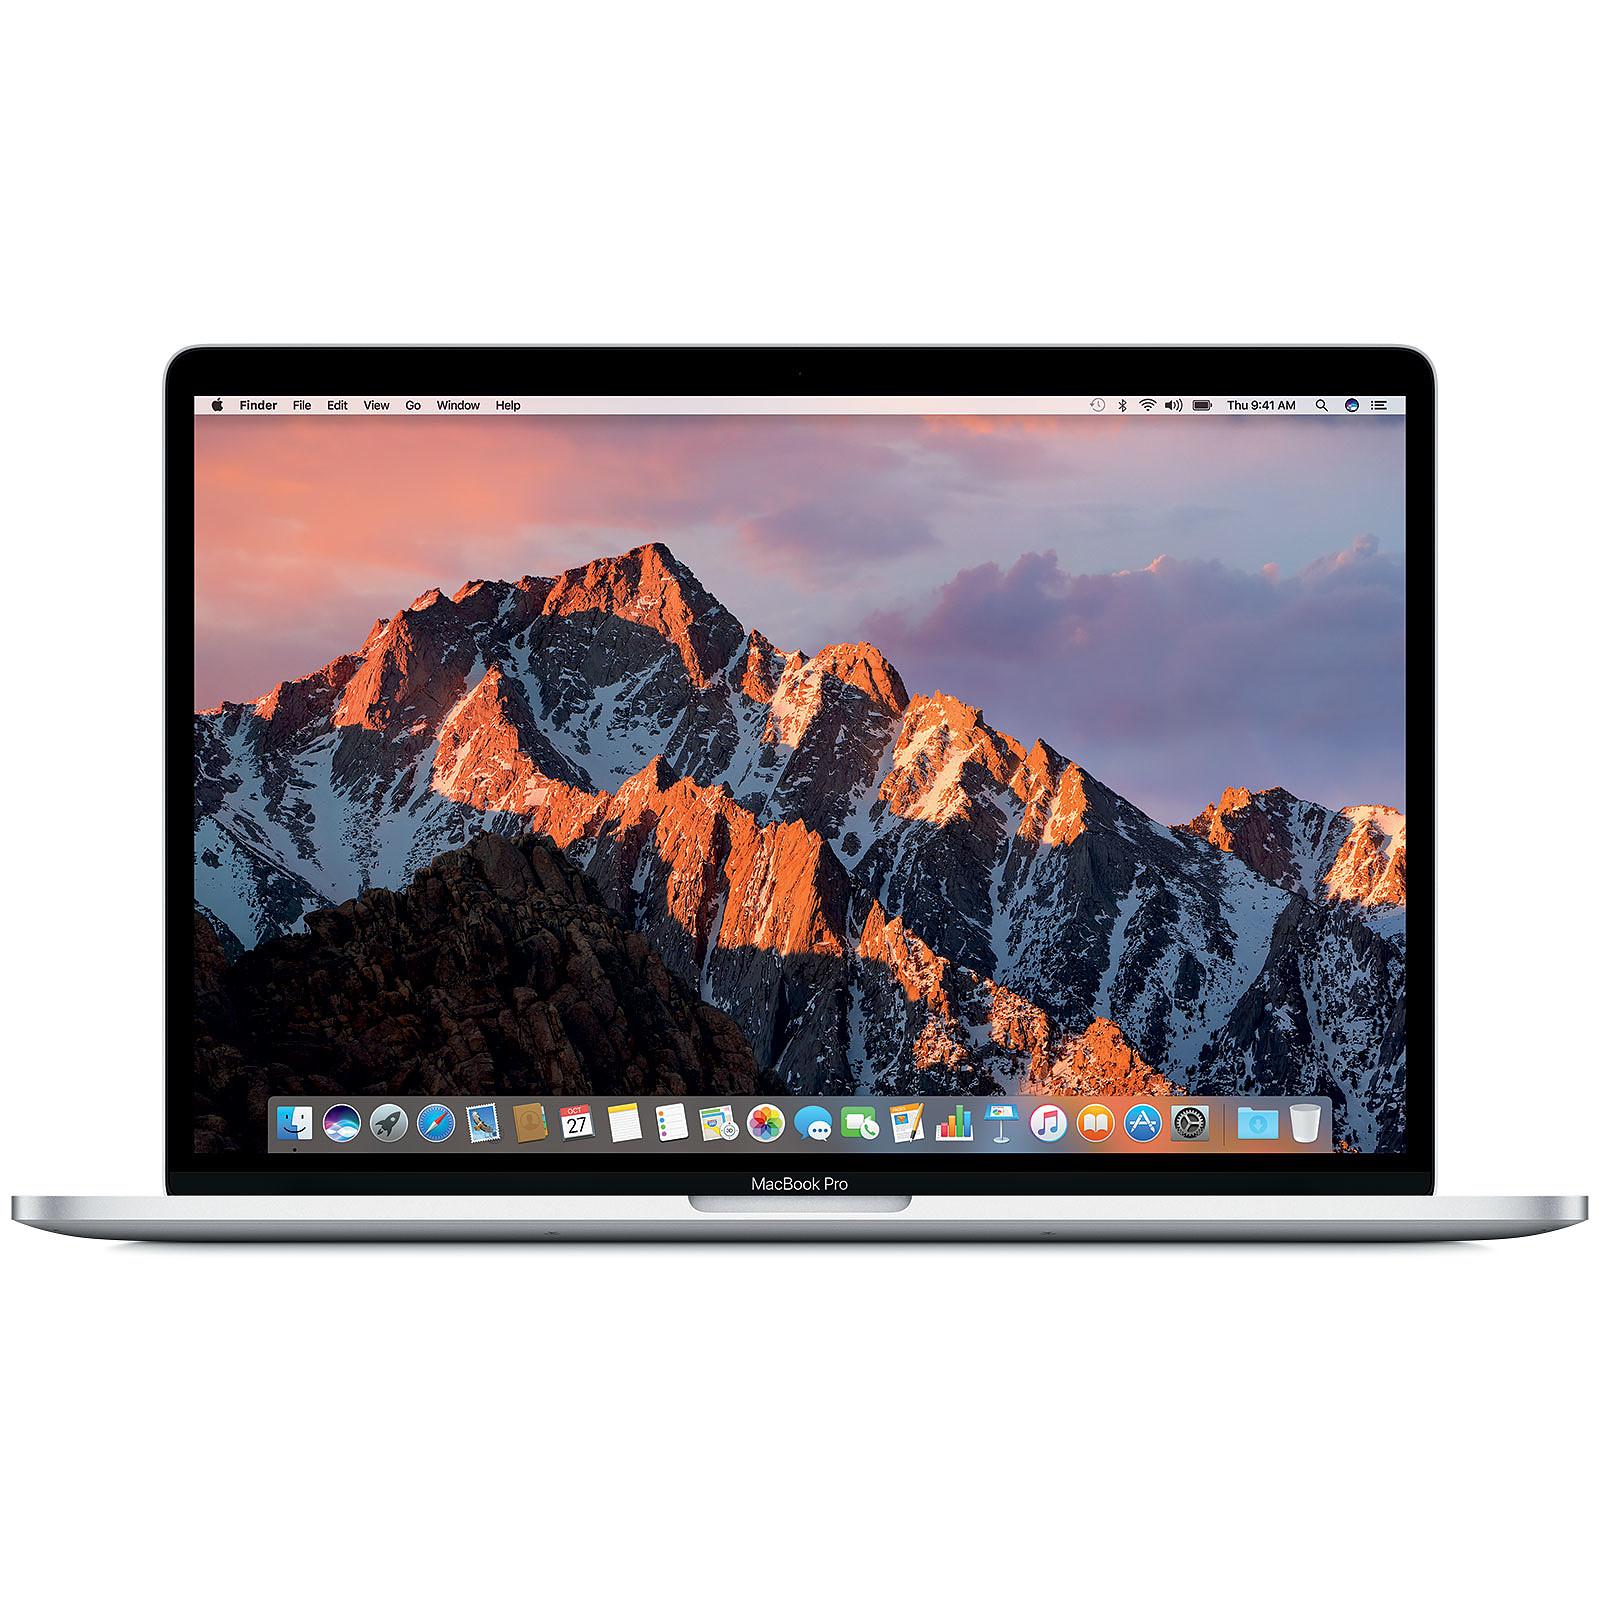 "Apple MacBook Pro 15"" Argent (MLW82FN/A) · Reconditionné"